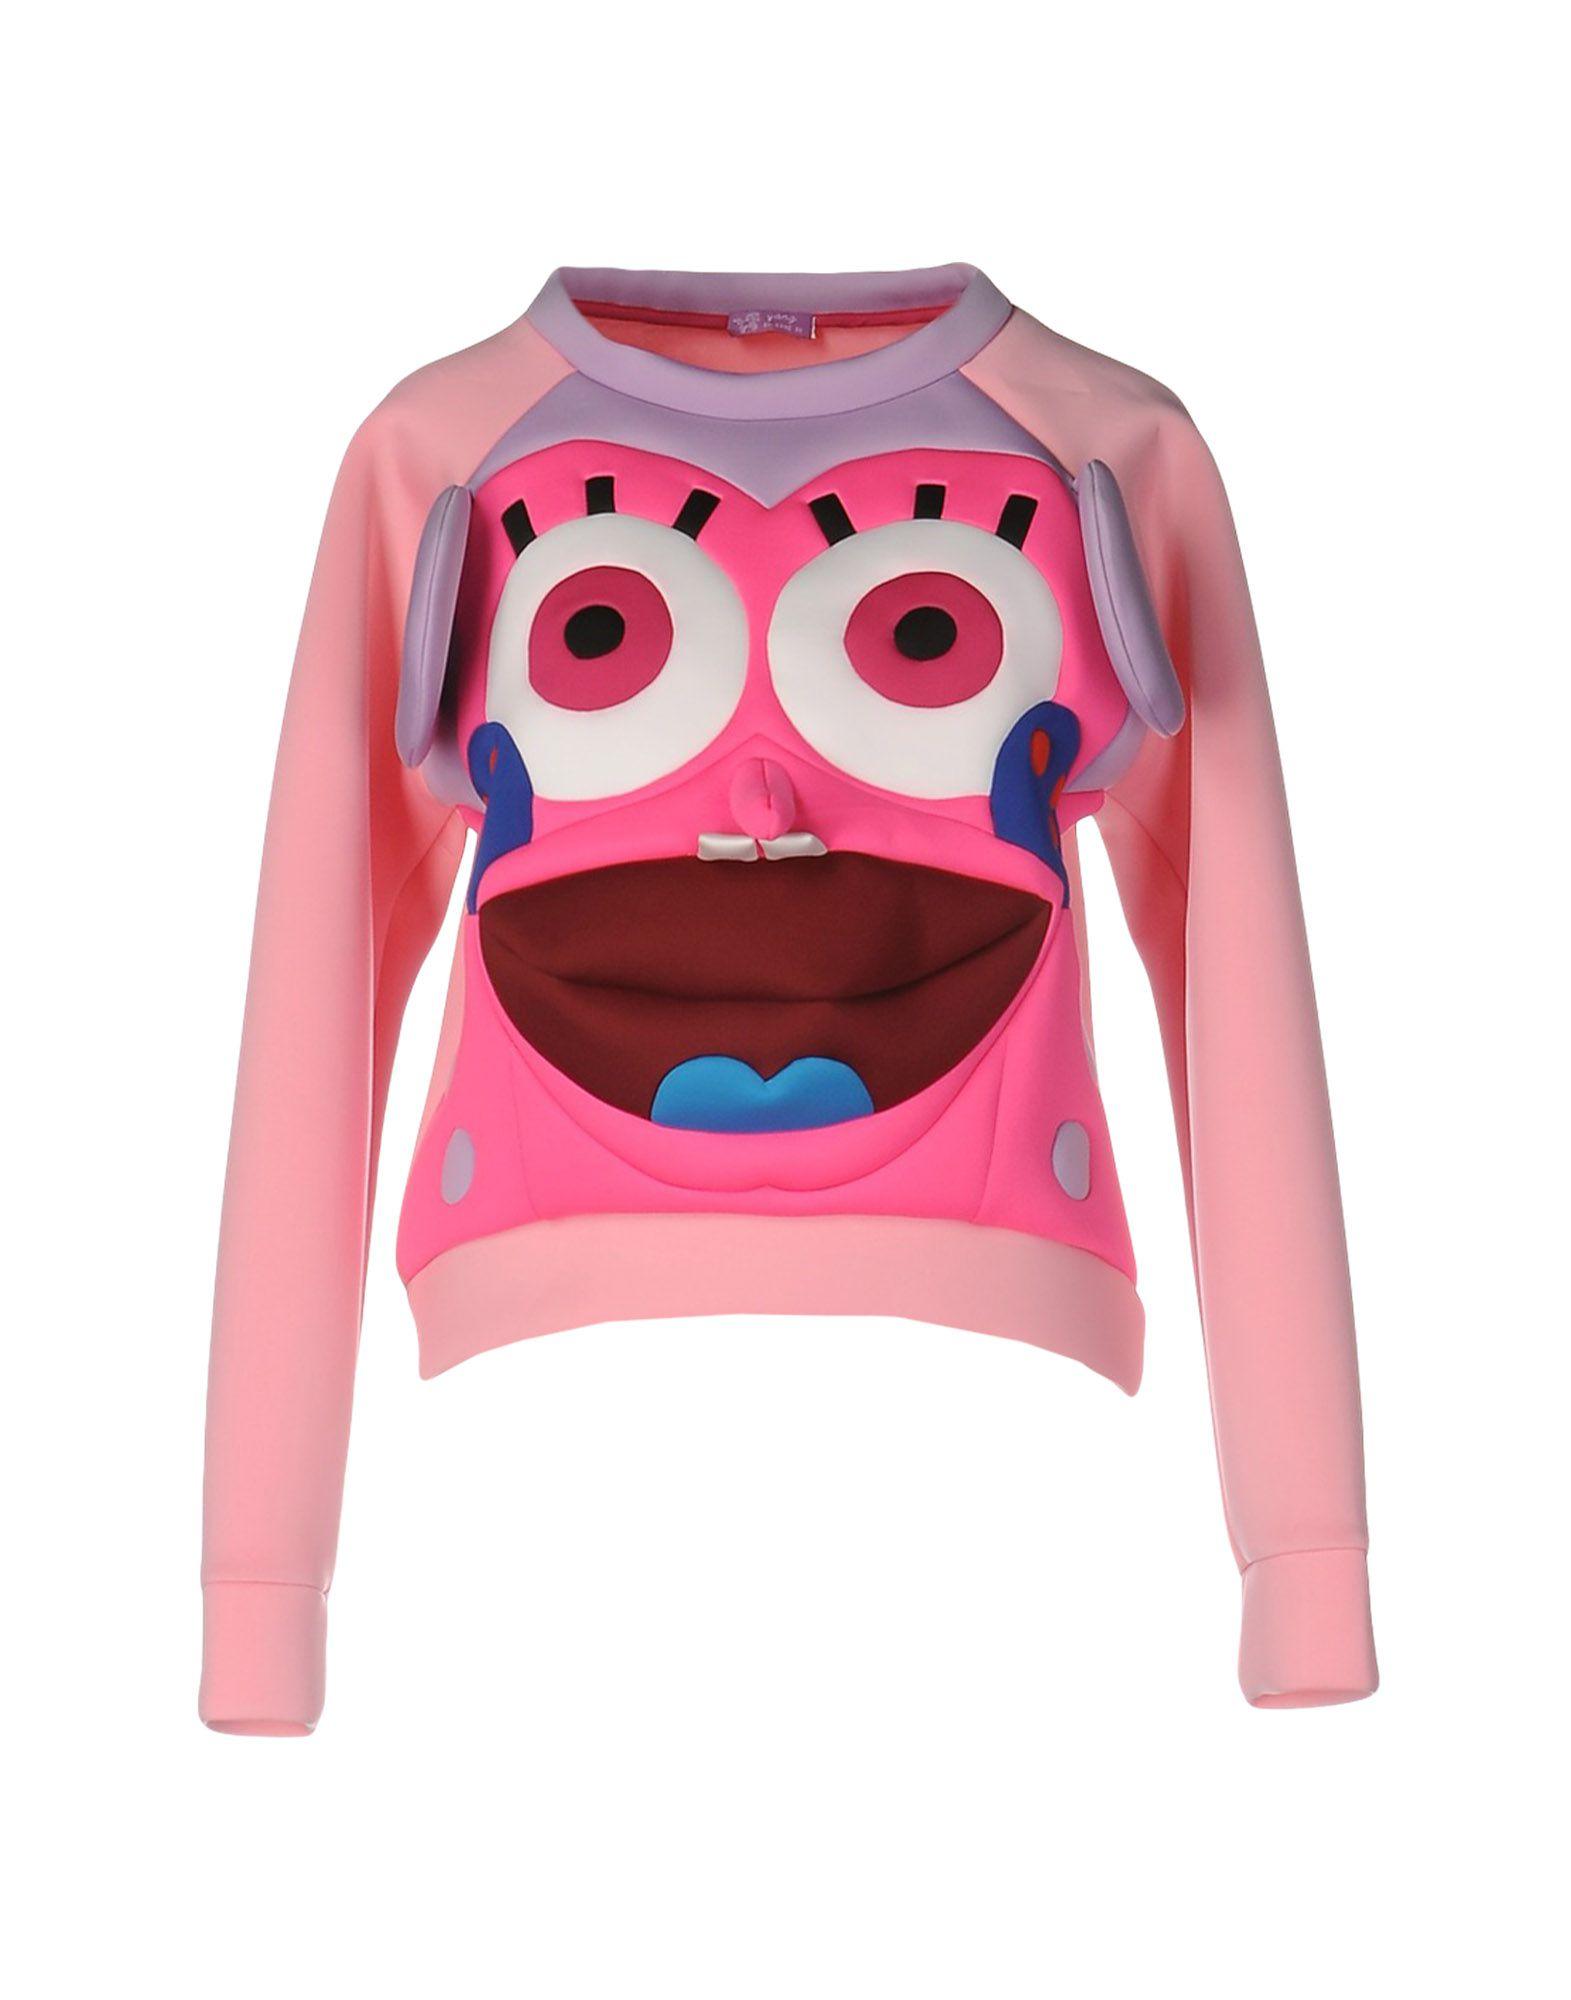 YANG DU Sweatshirt in Fuchsia